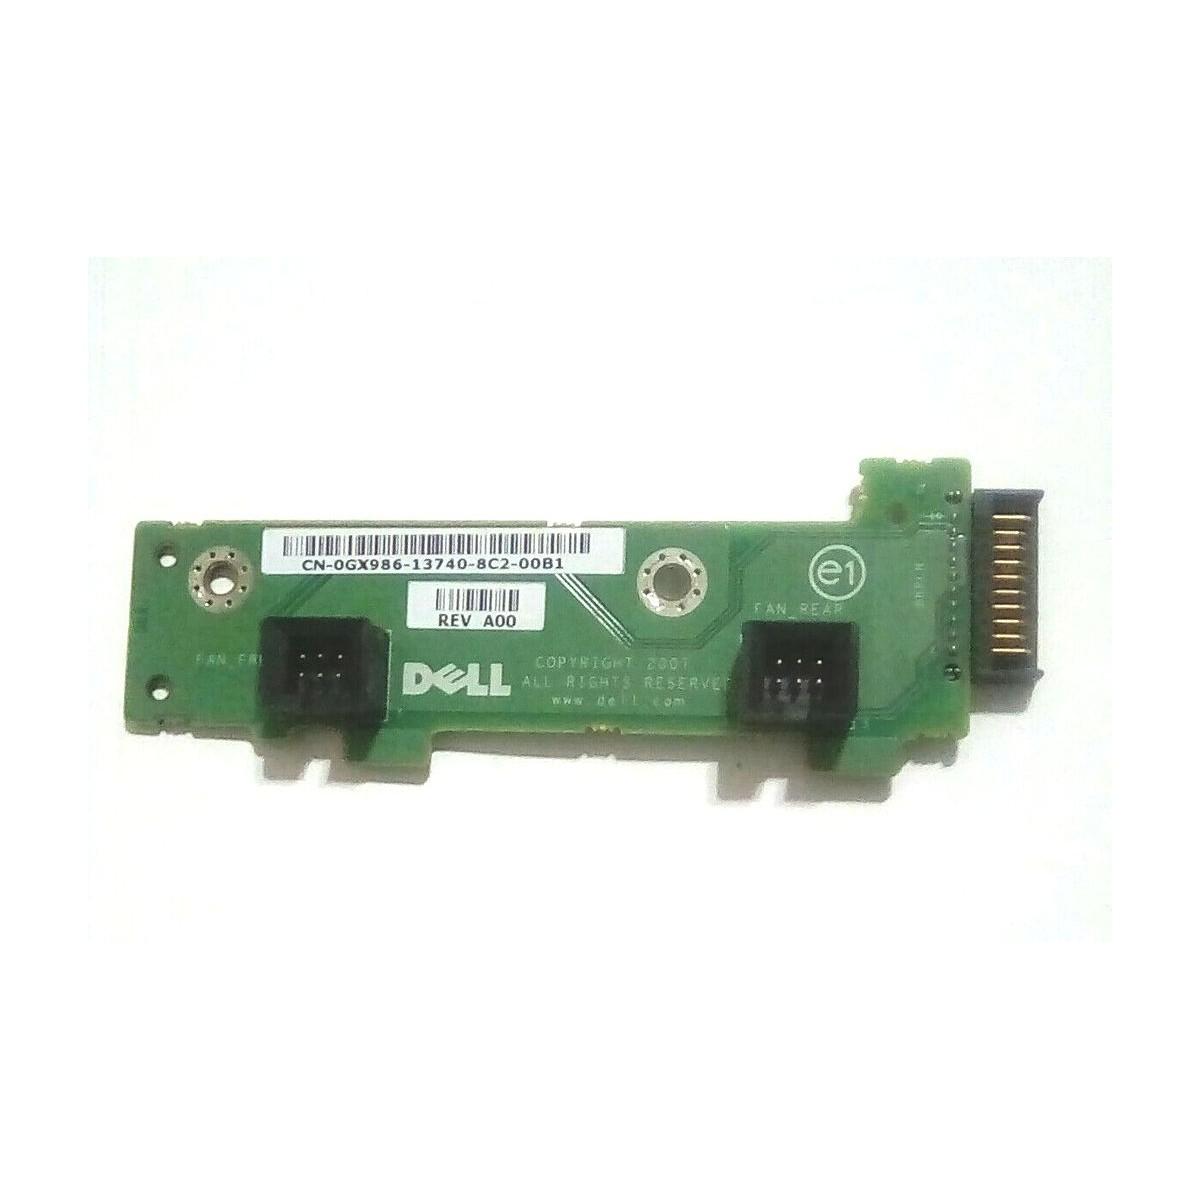 ATI RAGE XL 8MB AGP VGA GRAPHICS VIDEO CARD